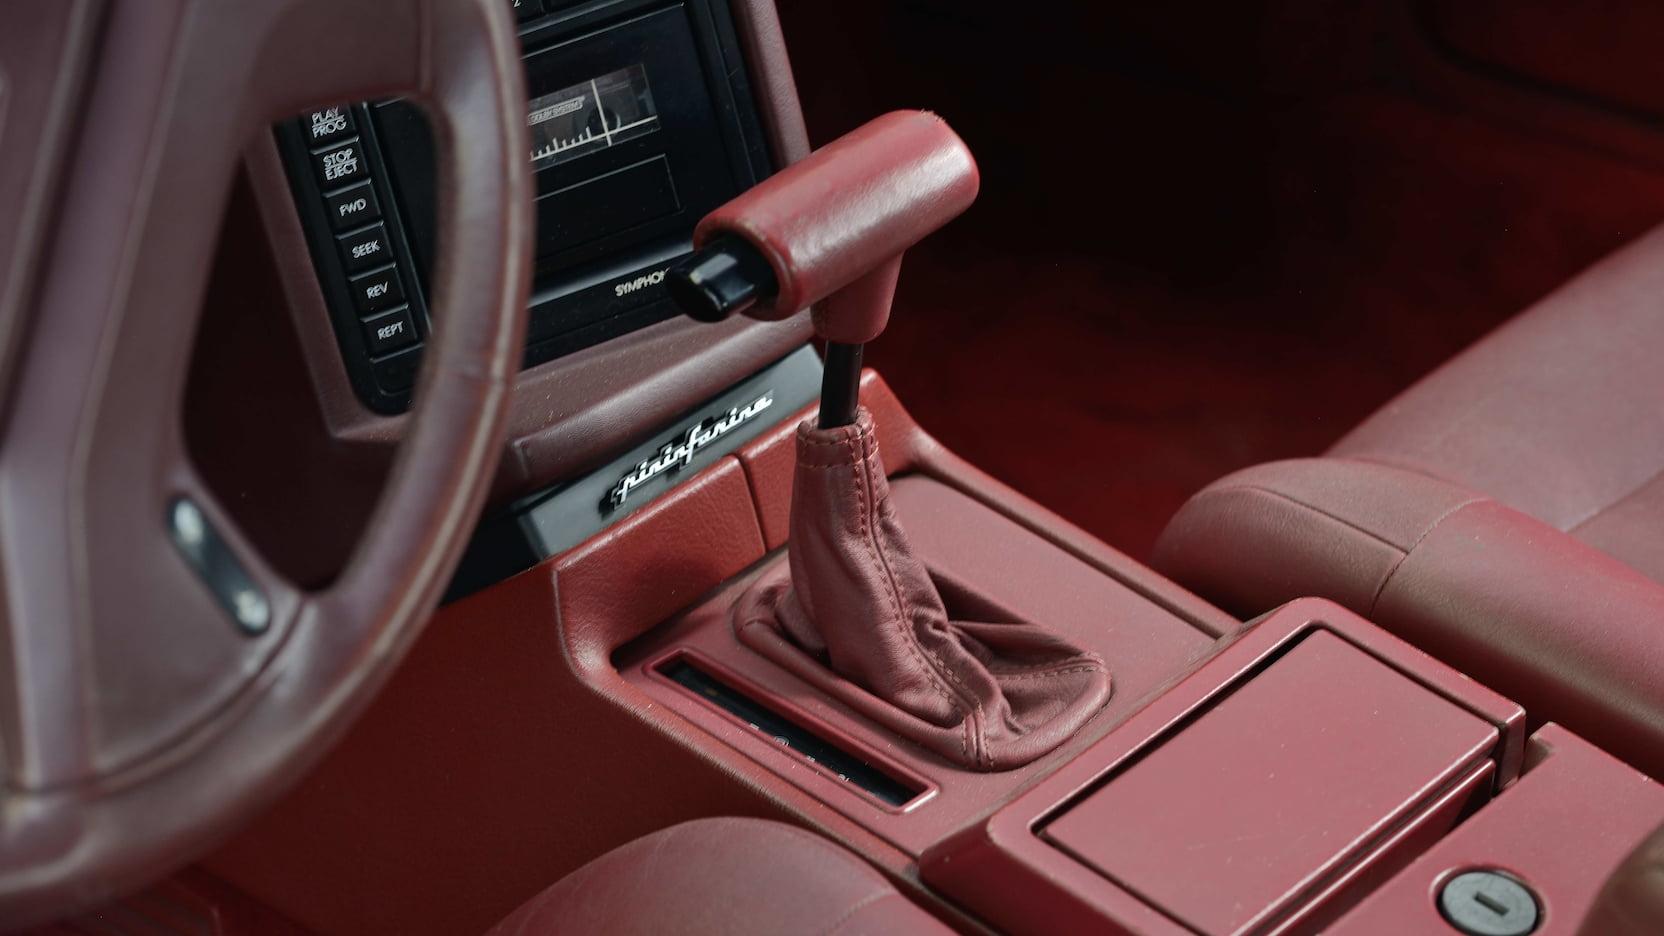 1987 Cadillac Allante shifter